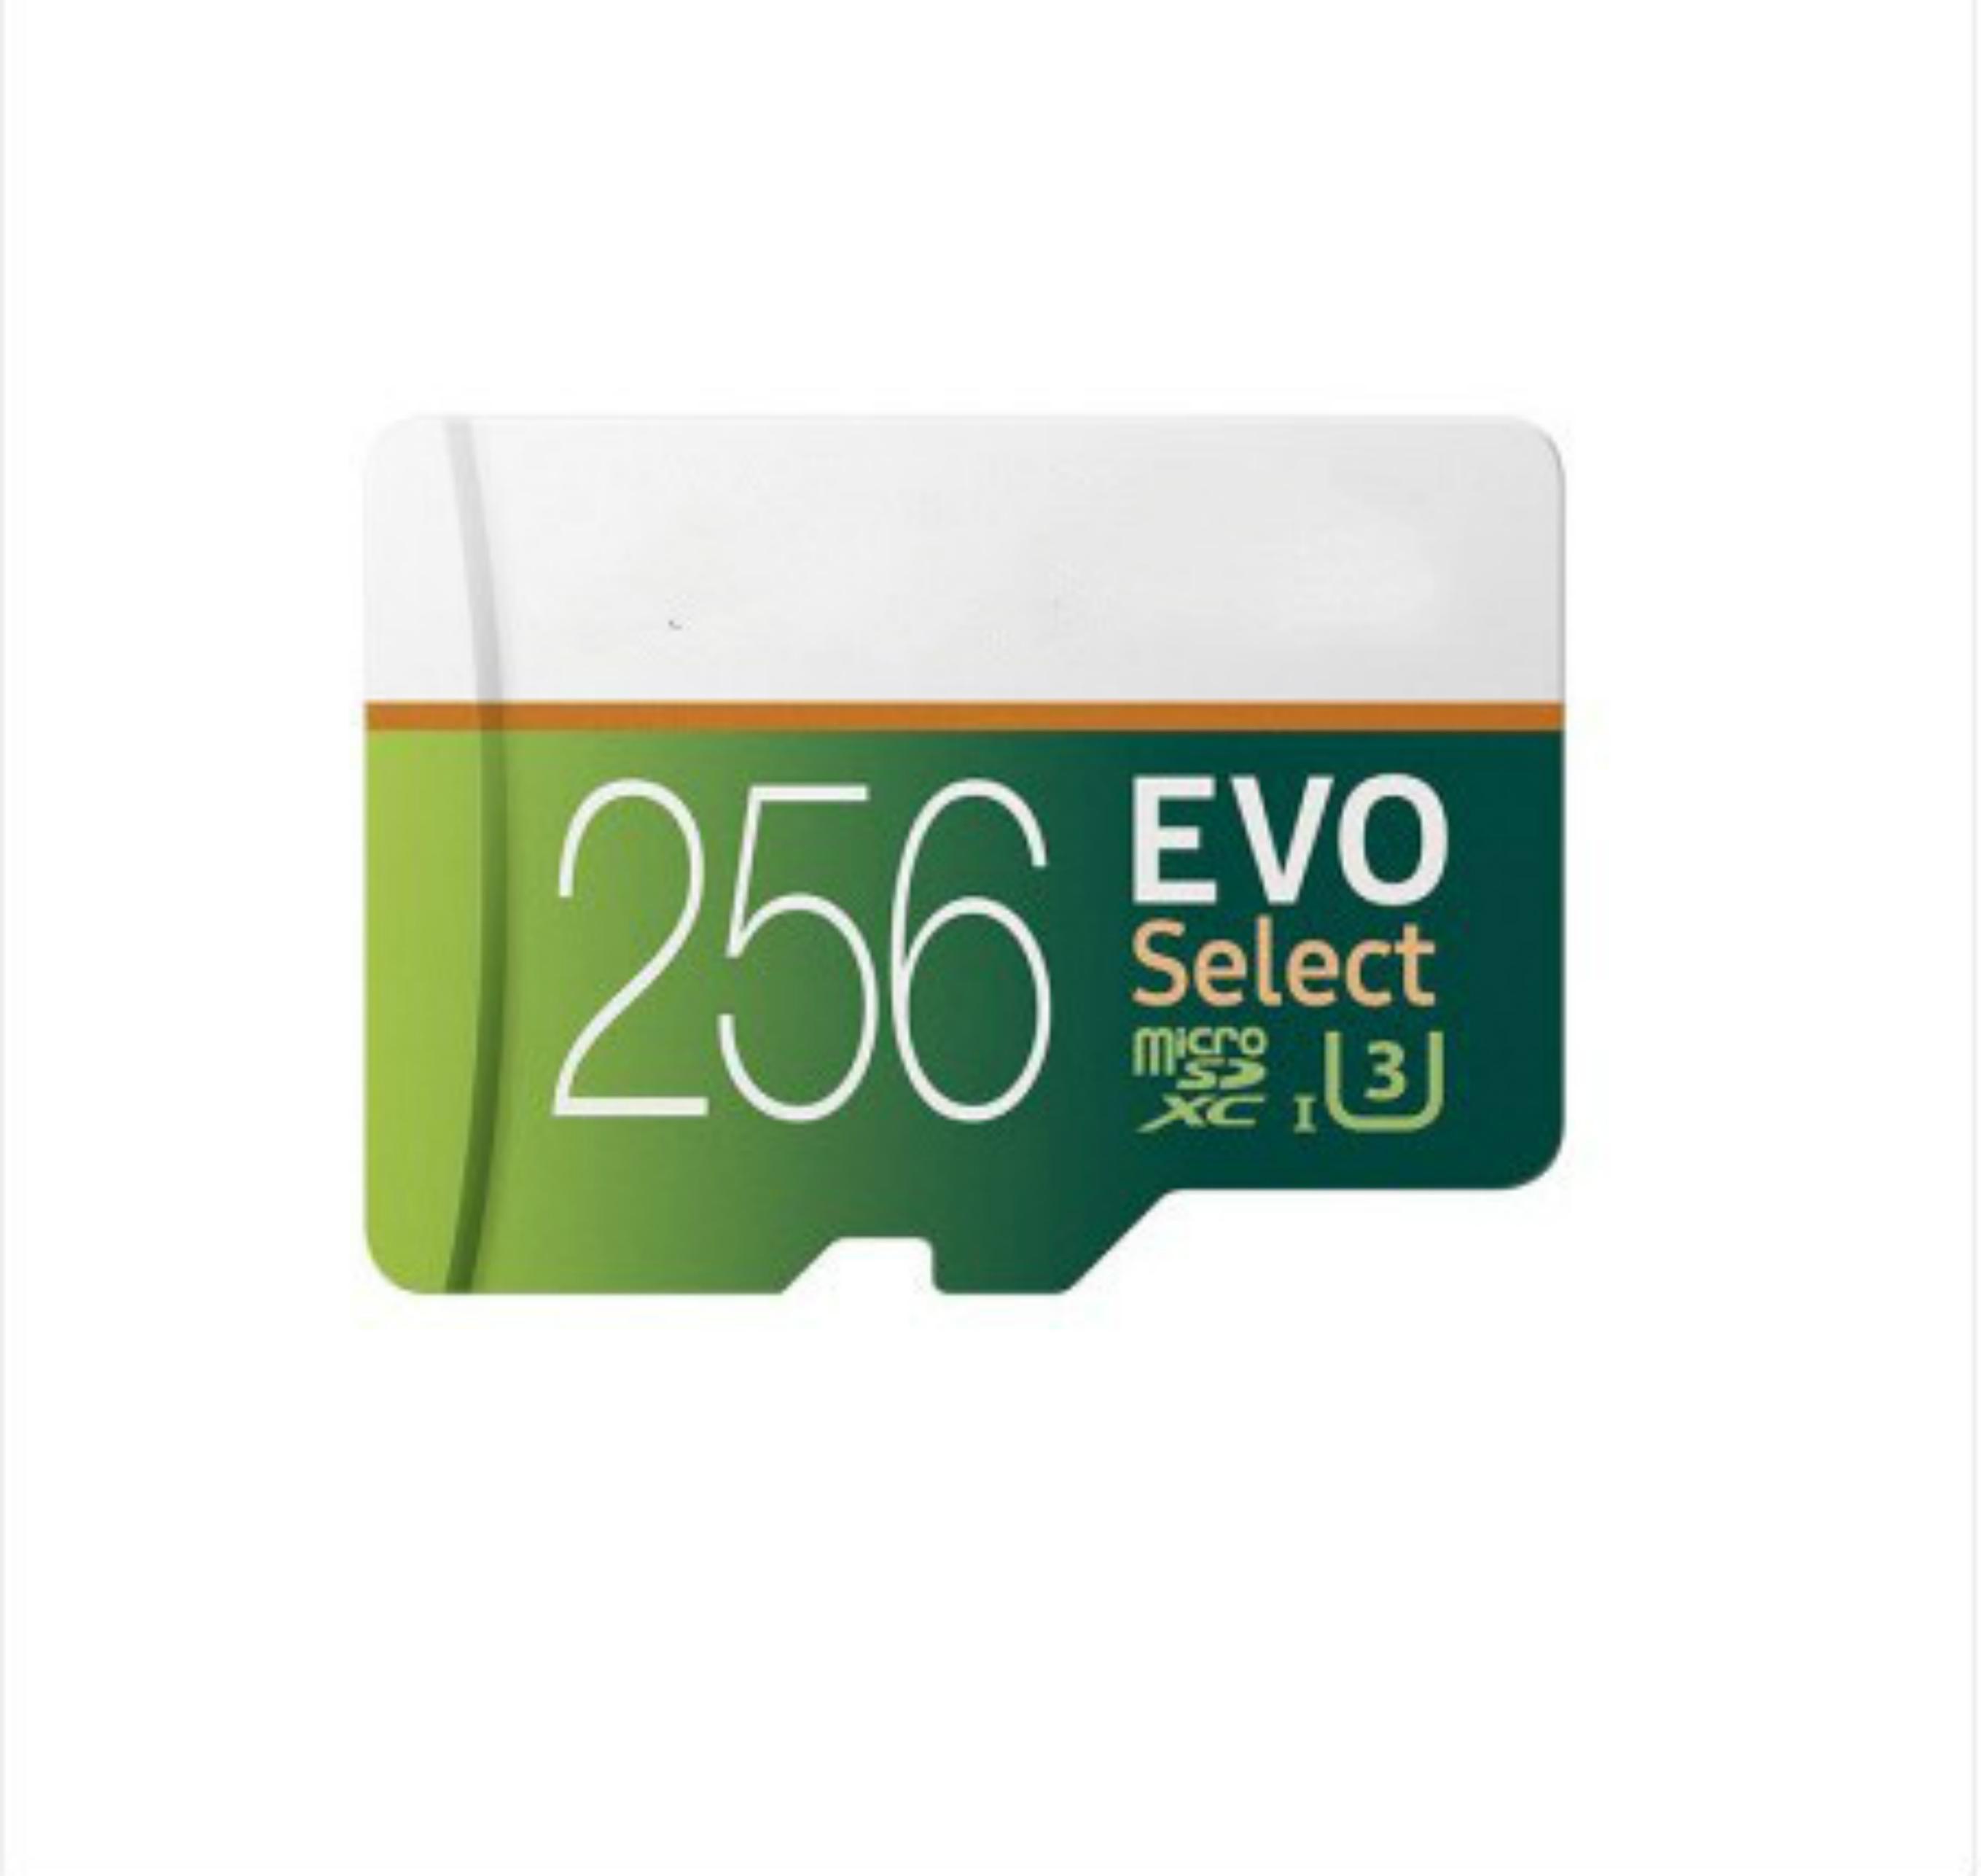 32GB / 64GB / 128GB / 256GB Samsung Evo Выбрать карту Micro SD / смартфон SDXC Кладка для хранения / TF Card / HD-камера памяти 100 МБ / с